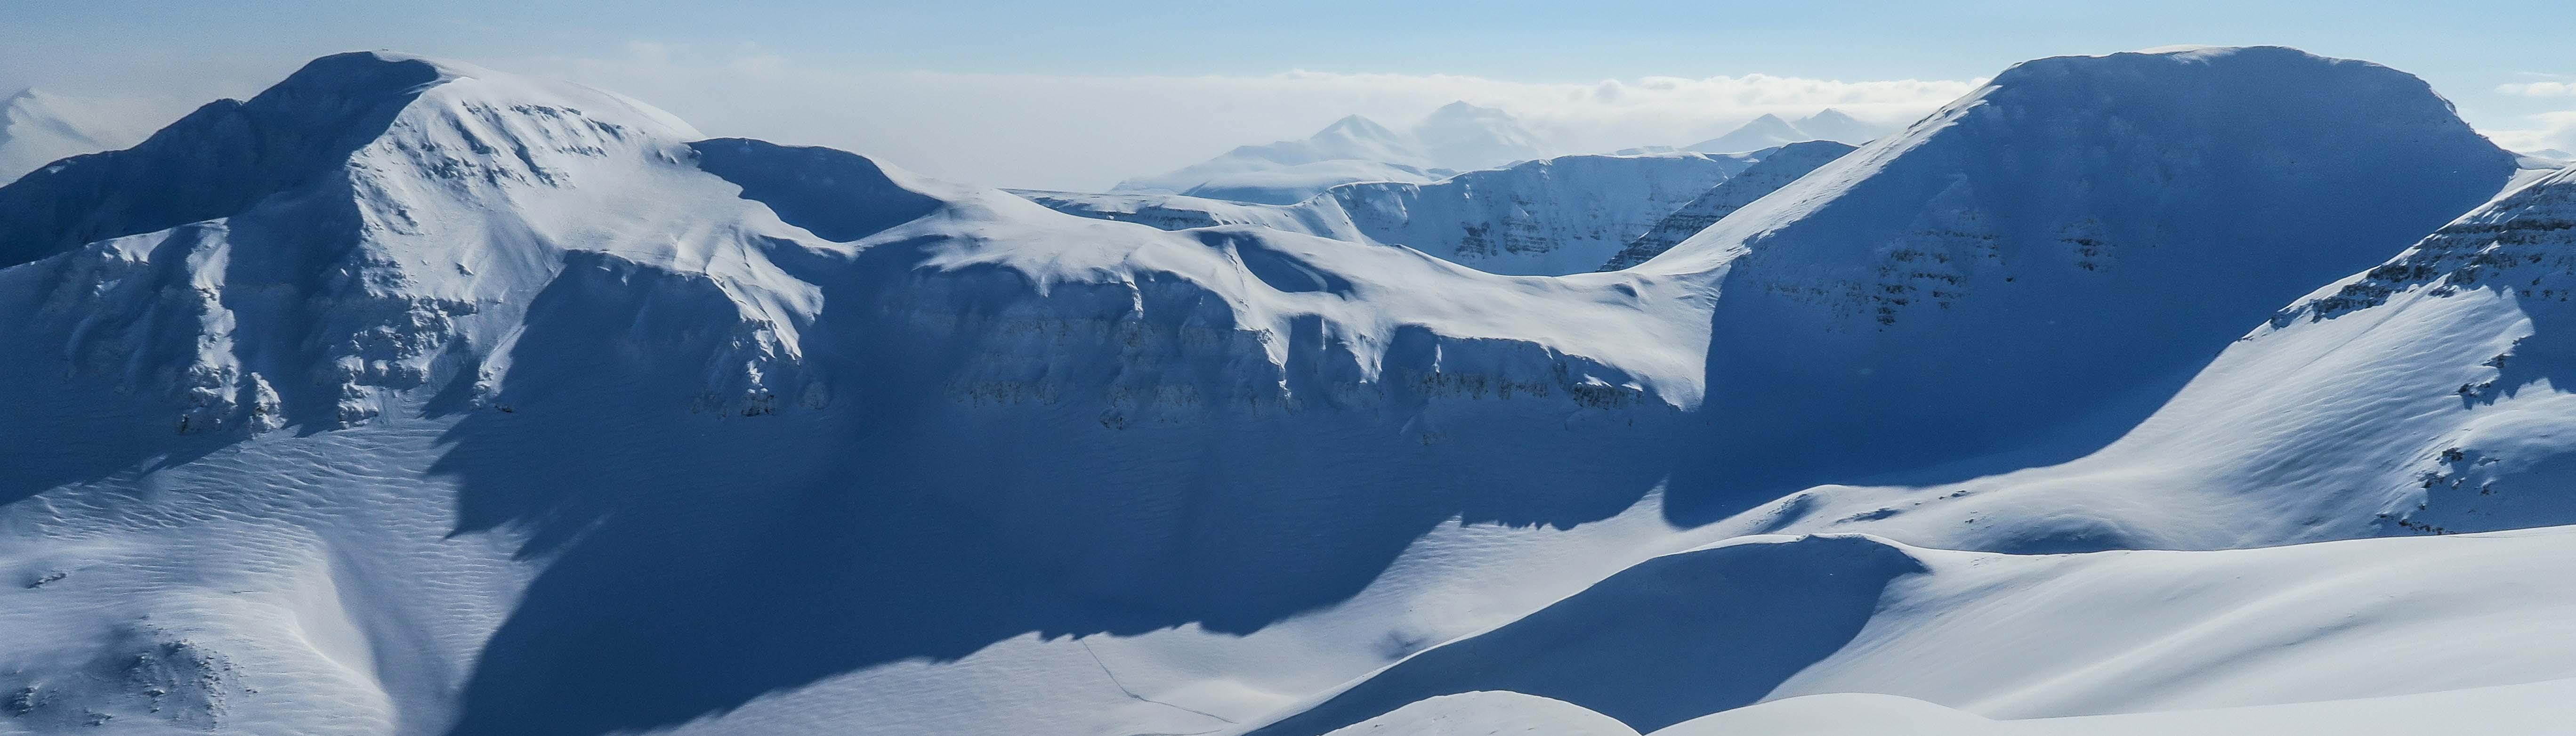 Island Skitouren